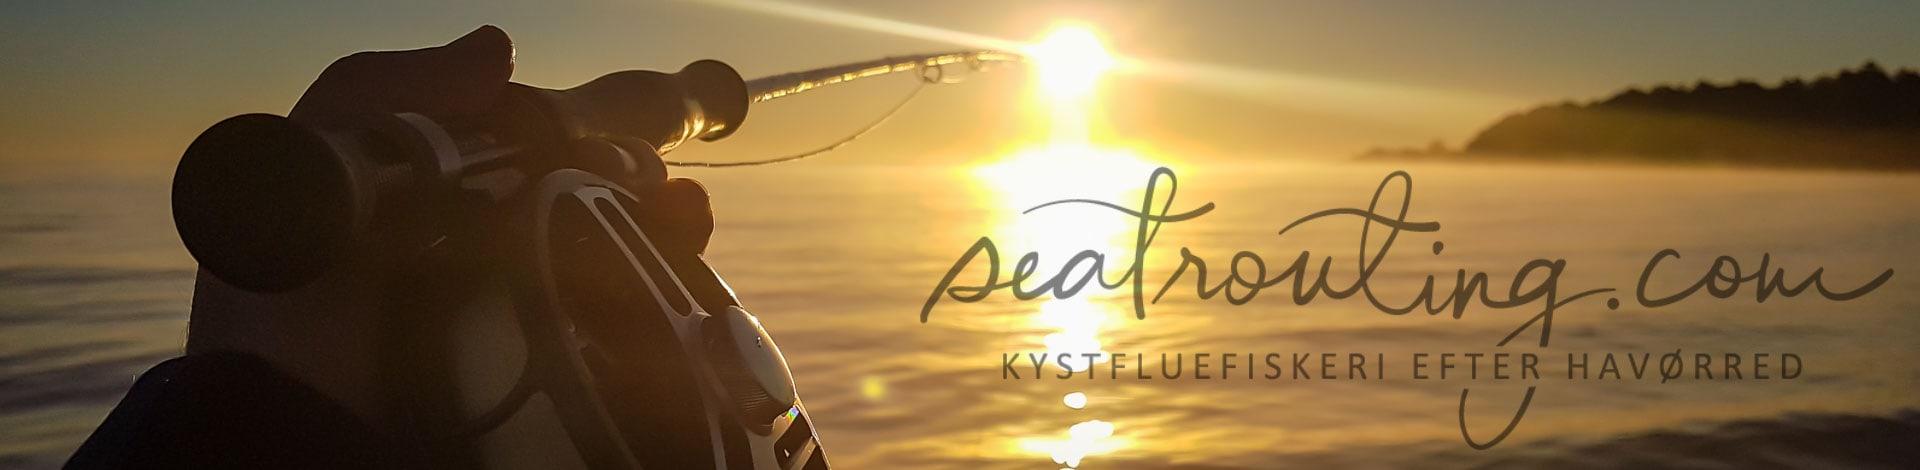 seatrouting kystfluefiskeri havørred kysten danmark sjælland møn kystfiskeri